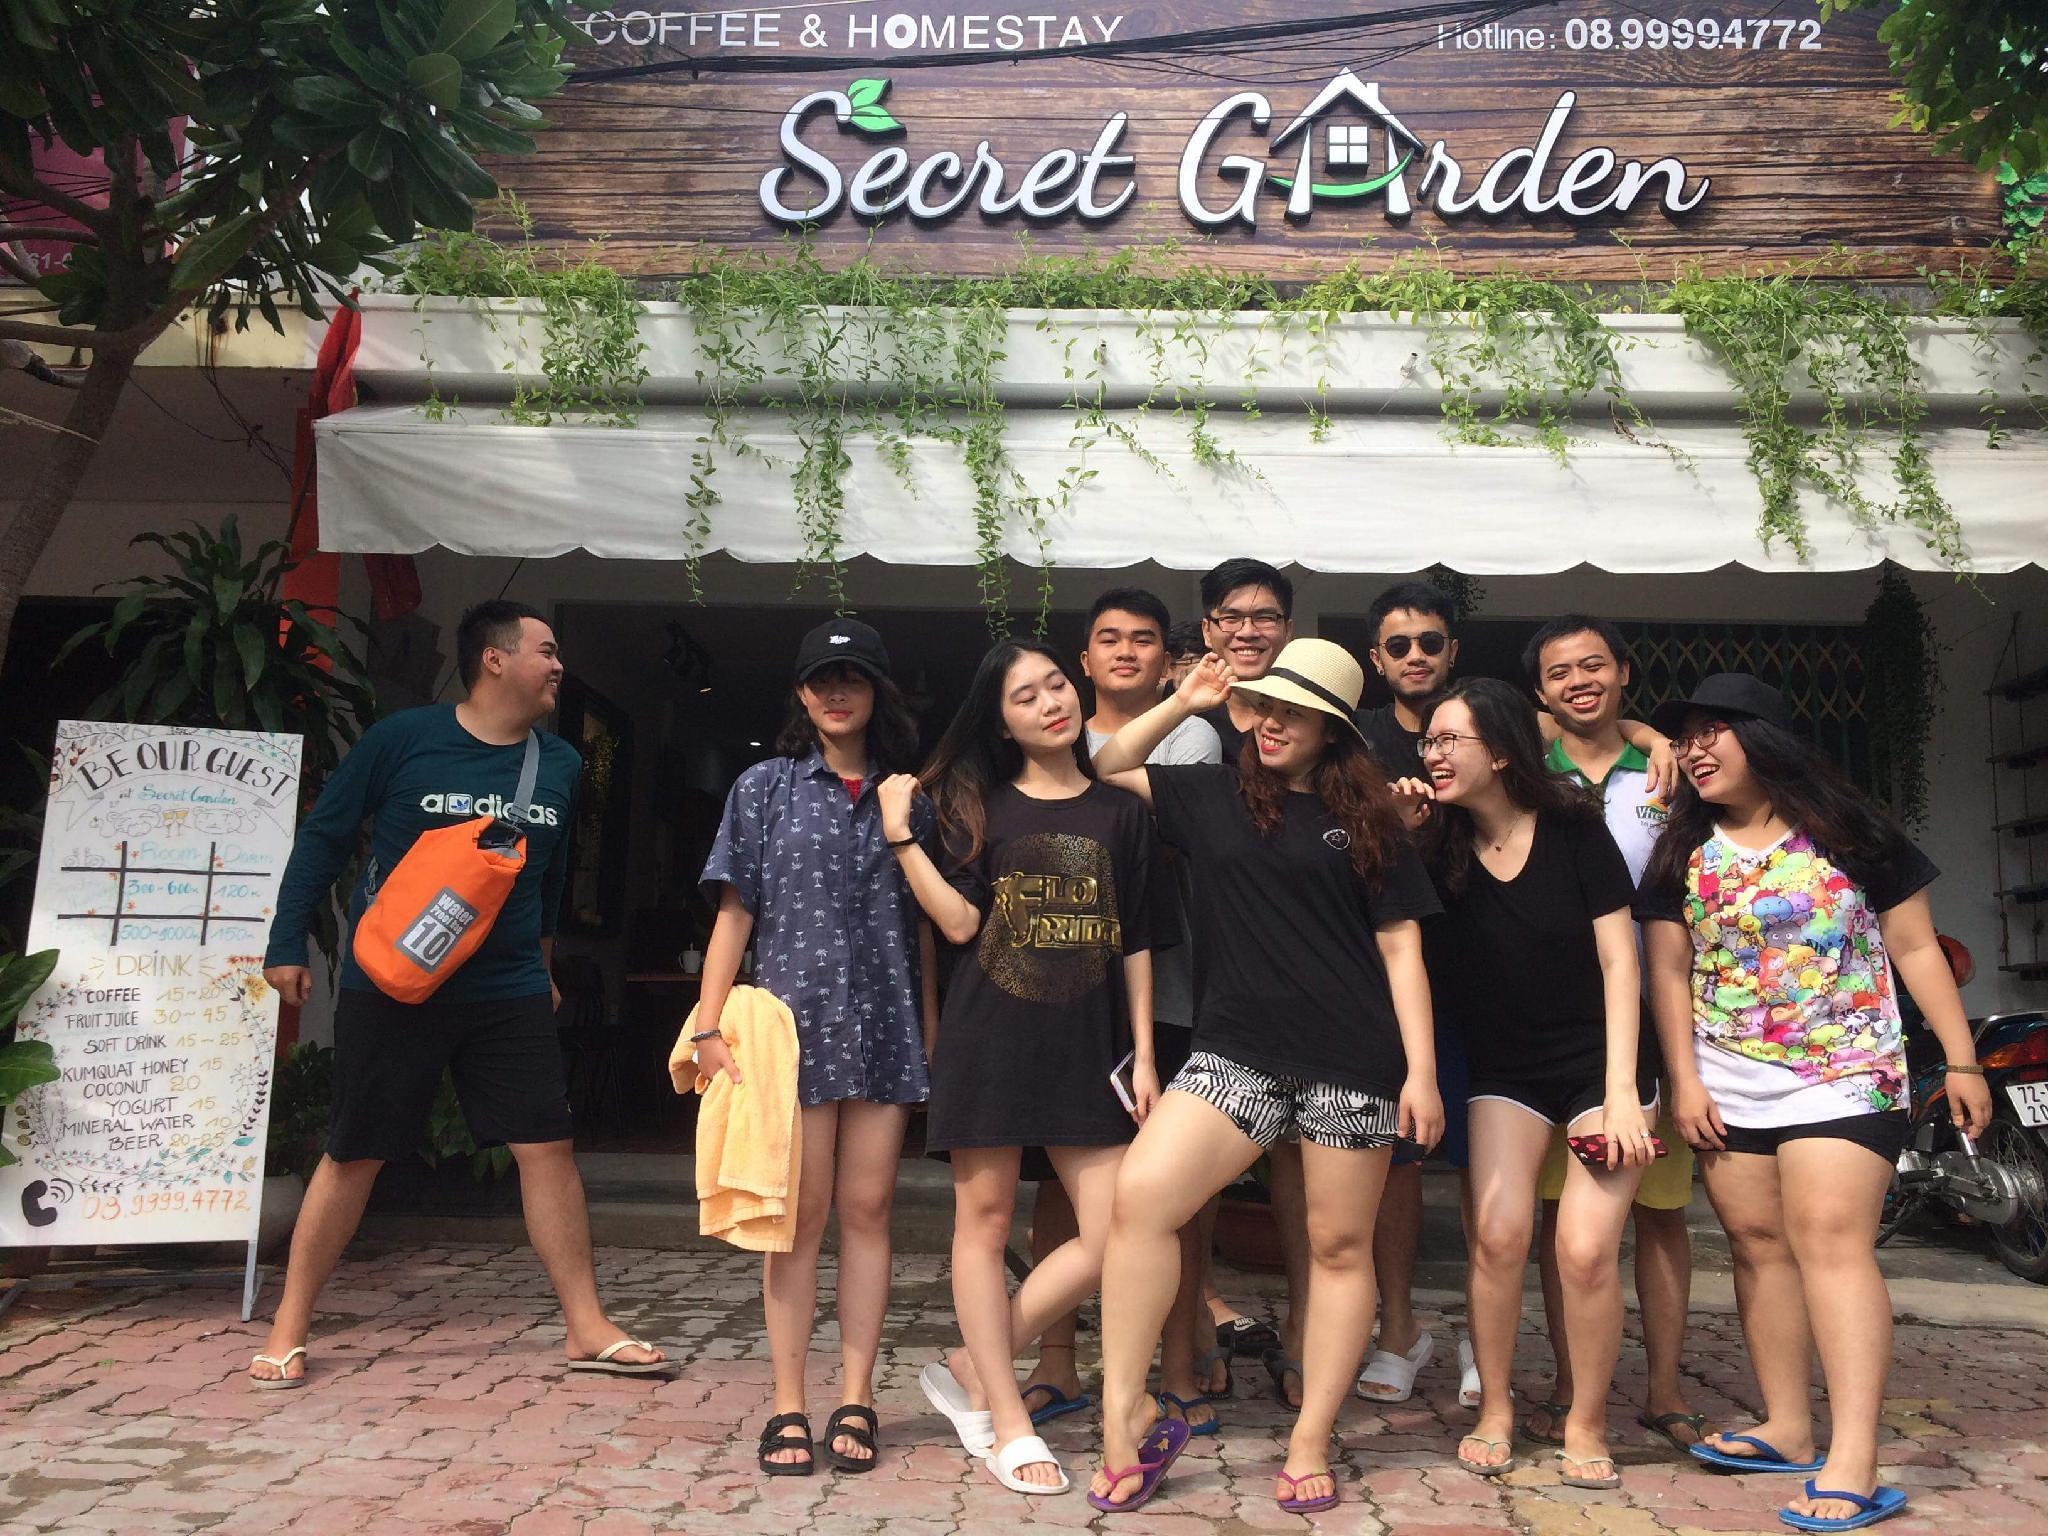 Secret Garden Coffee And Homestay   Vung Tau